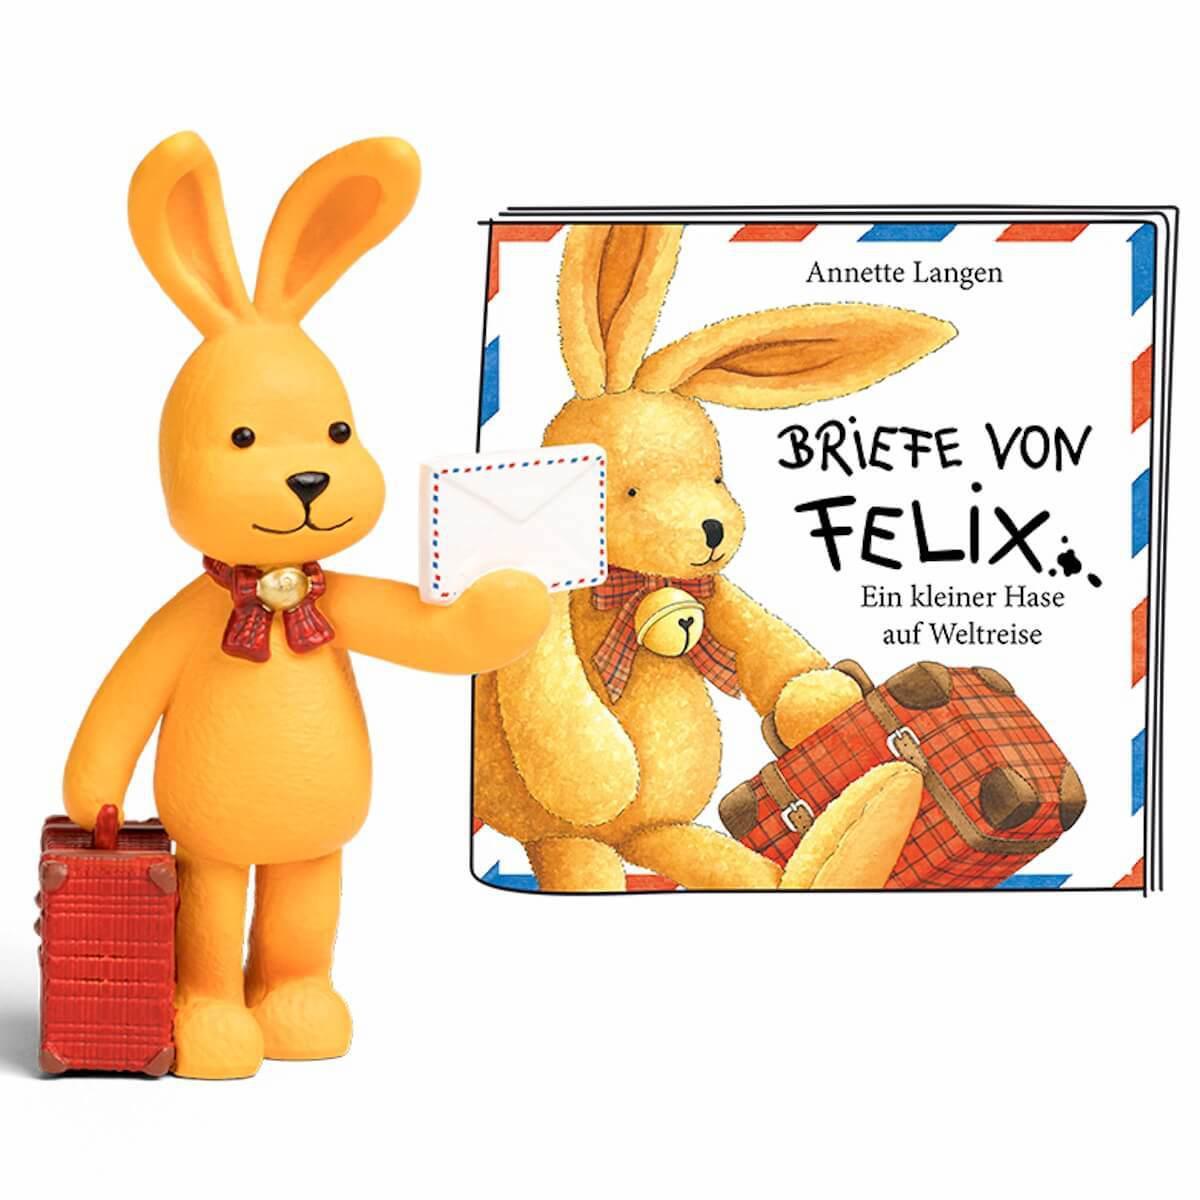 Hörspielfigur TONIES Felix Briefe von Felix